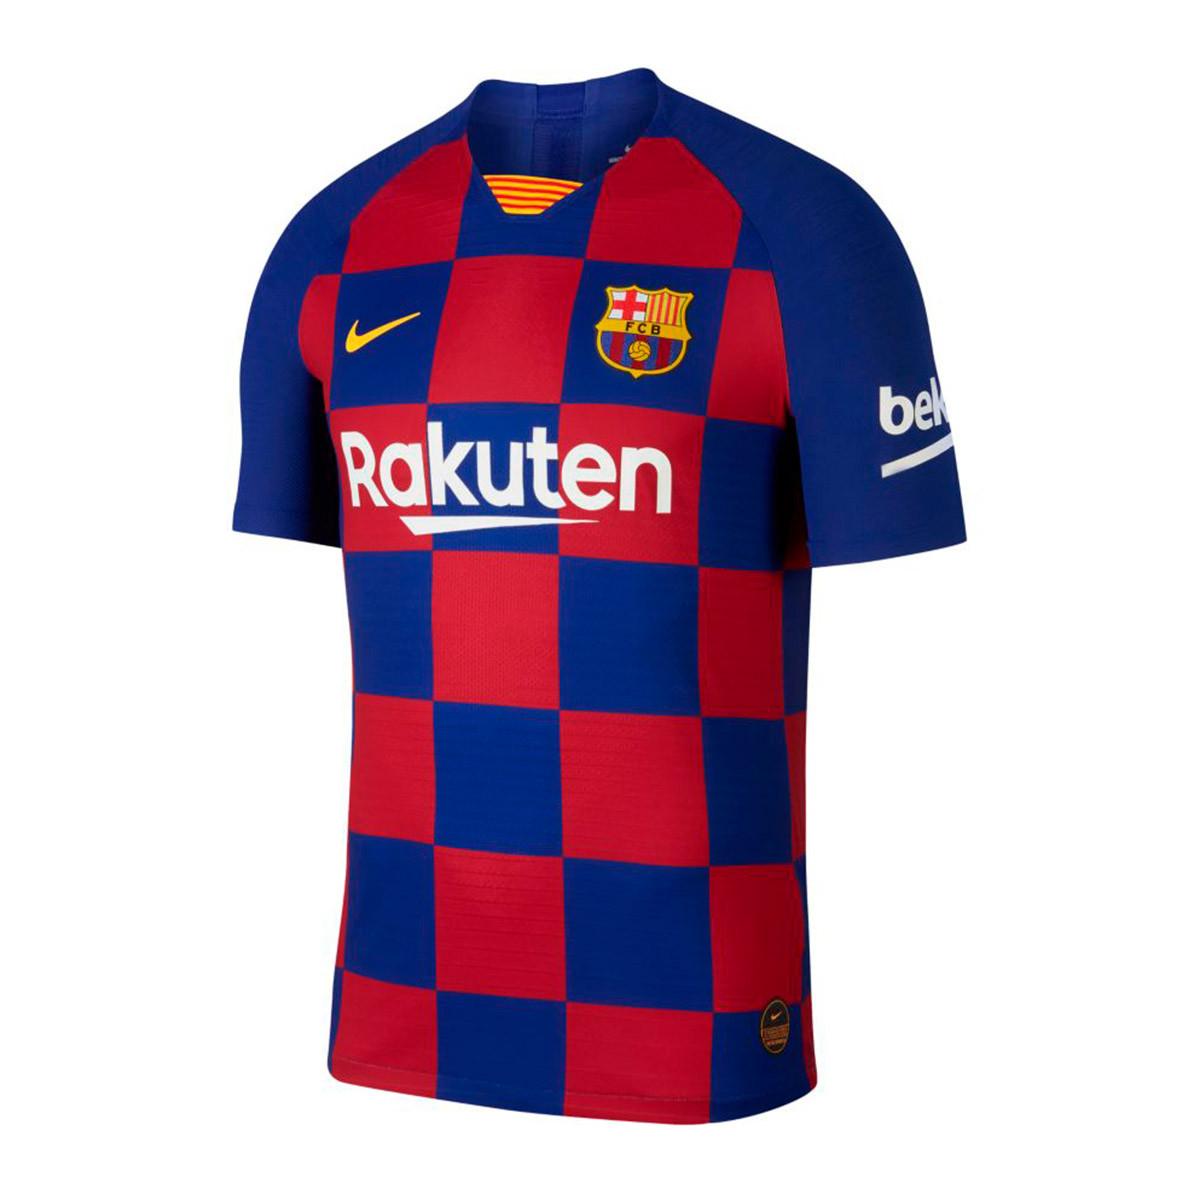 Jersey Nike Fc Barcelona Vapor Match Ss 2019 2020 Home Deep Royal Blue Varsity Maize Football Store Futbol Emotion